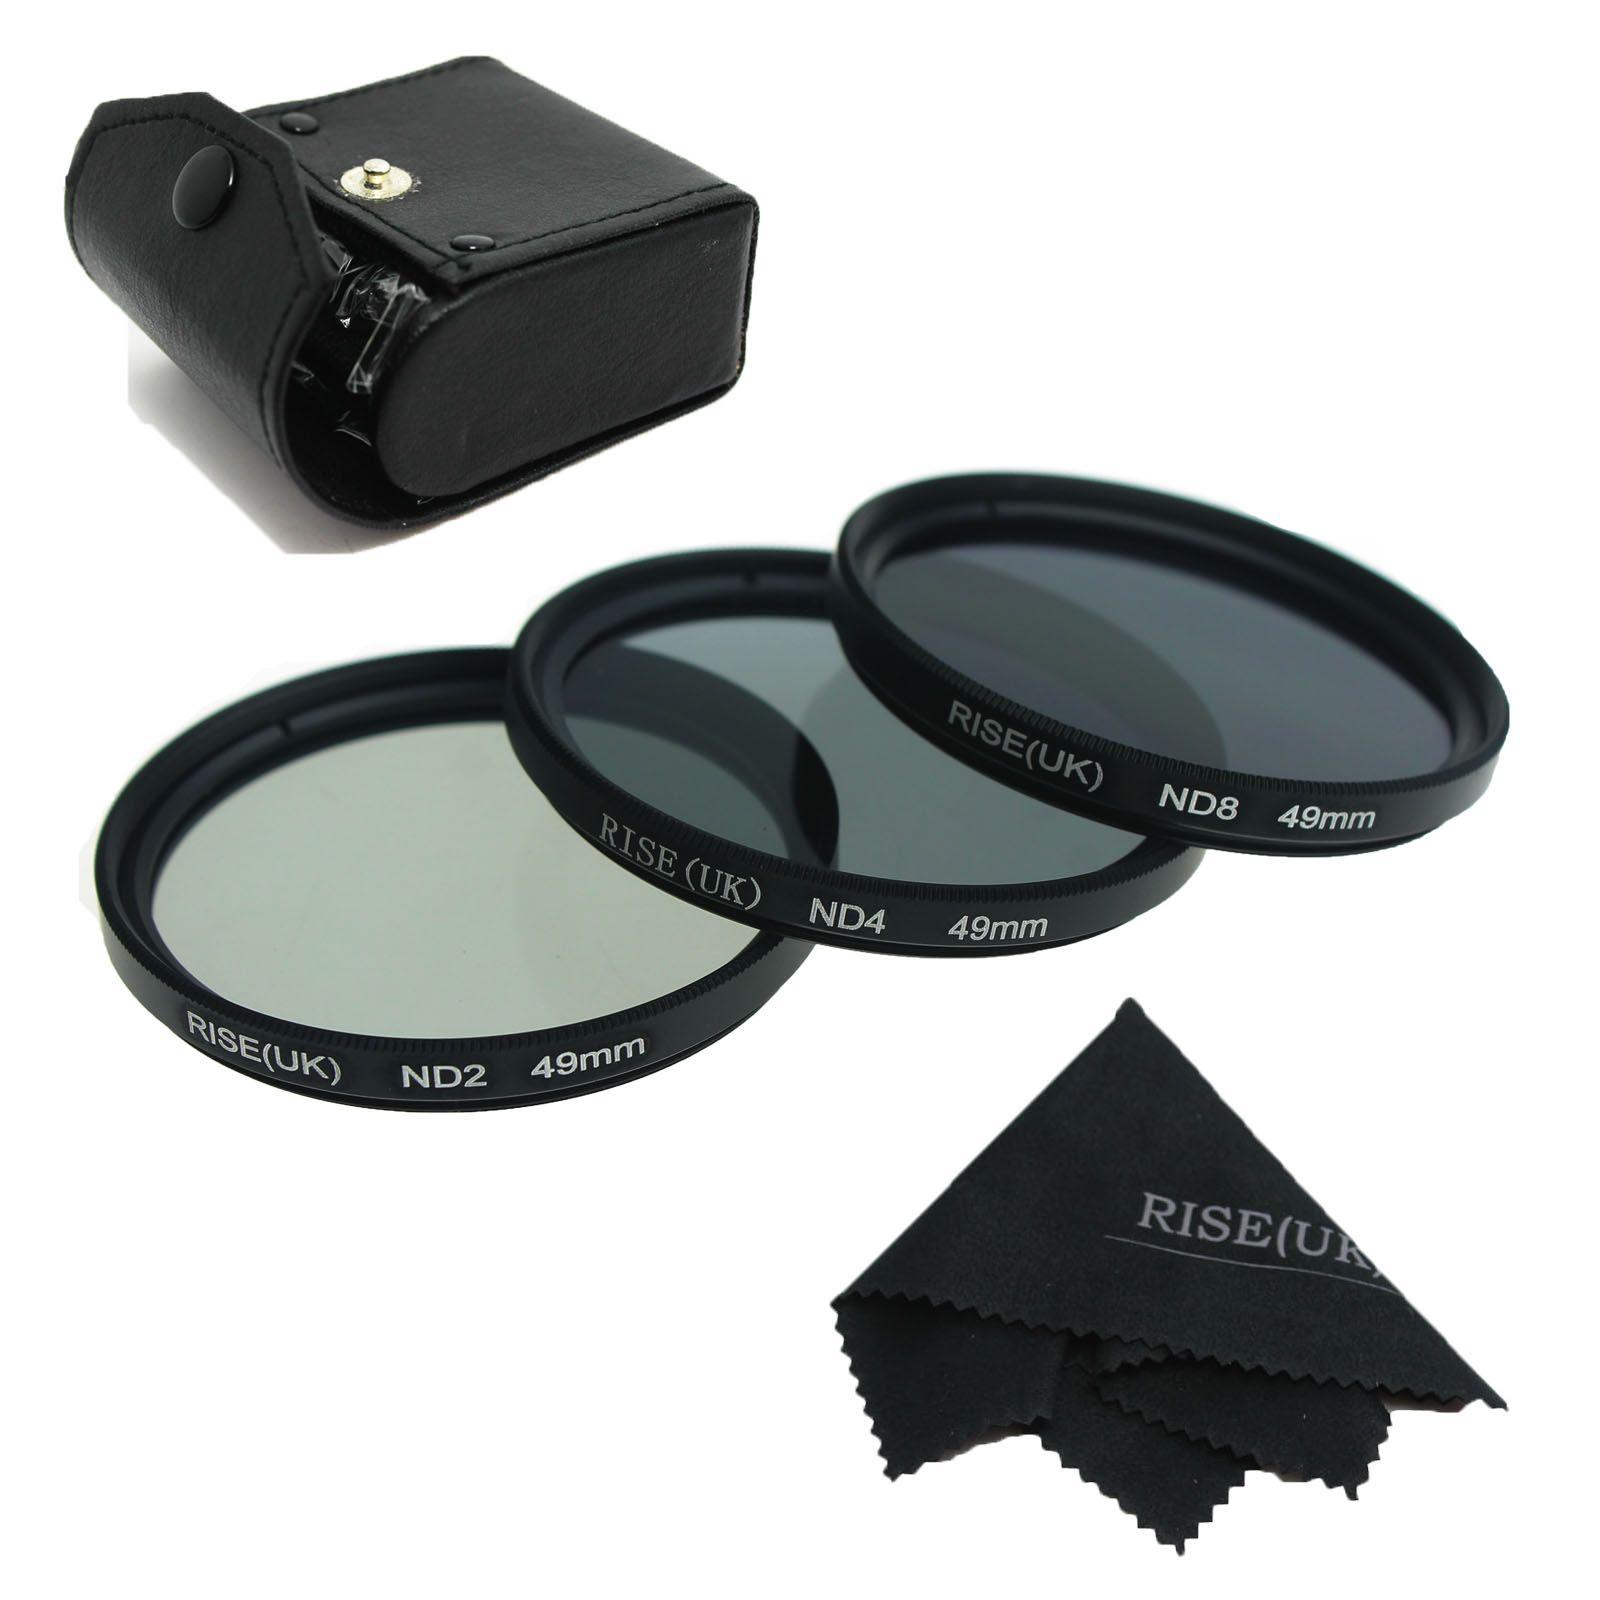 RISE (ROYAUME-UNI) 49mm 52mm 55mm 58mm 62mm 67mm 72mm 77mm Densité Neutre Filtre Objectif ensemble Kit ND2 ND4 ND8 ND 2 4 8